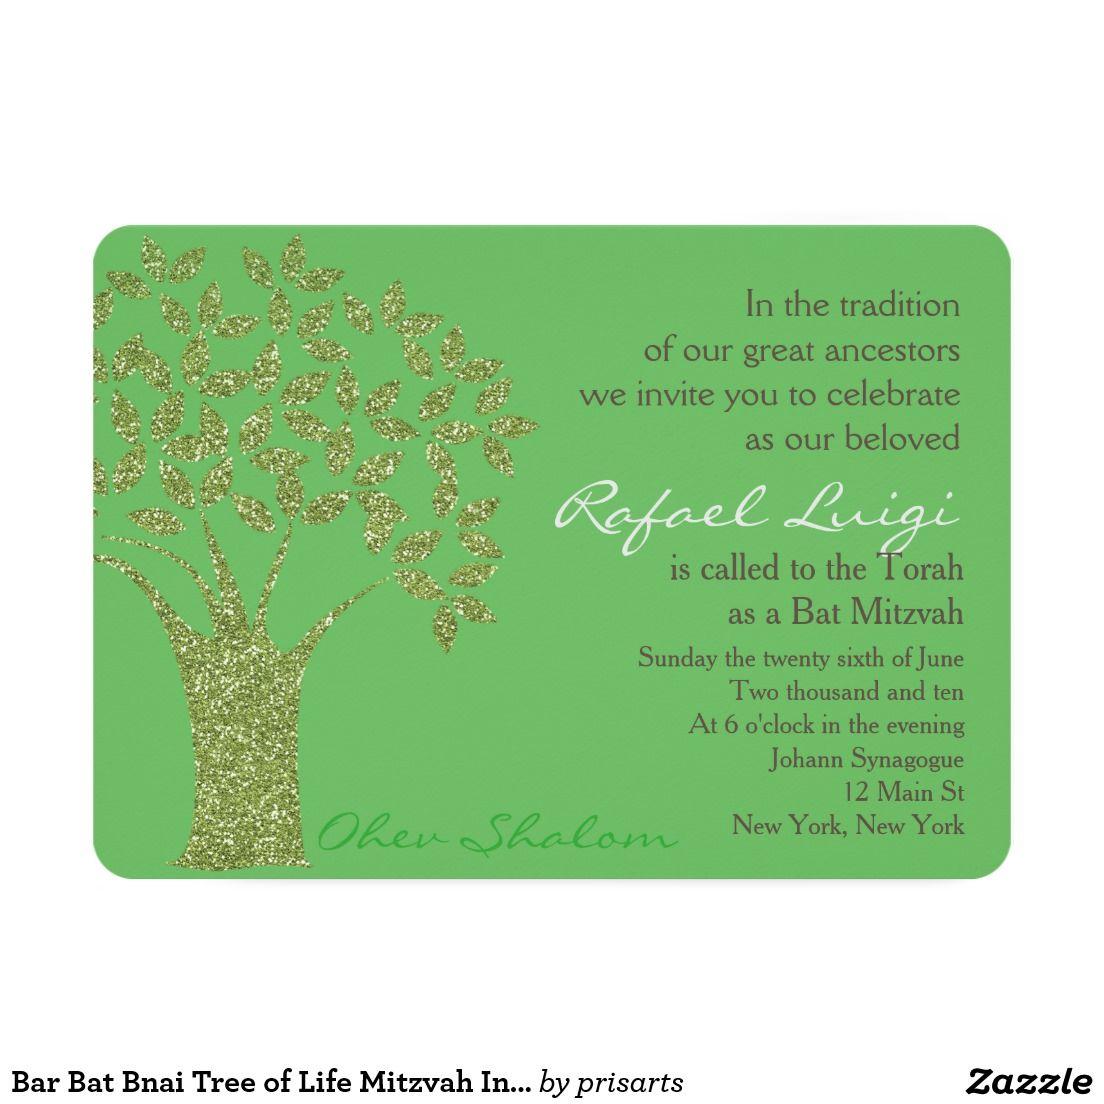 Bar Bat Bnai Tree of Life Mitzvah Invitation